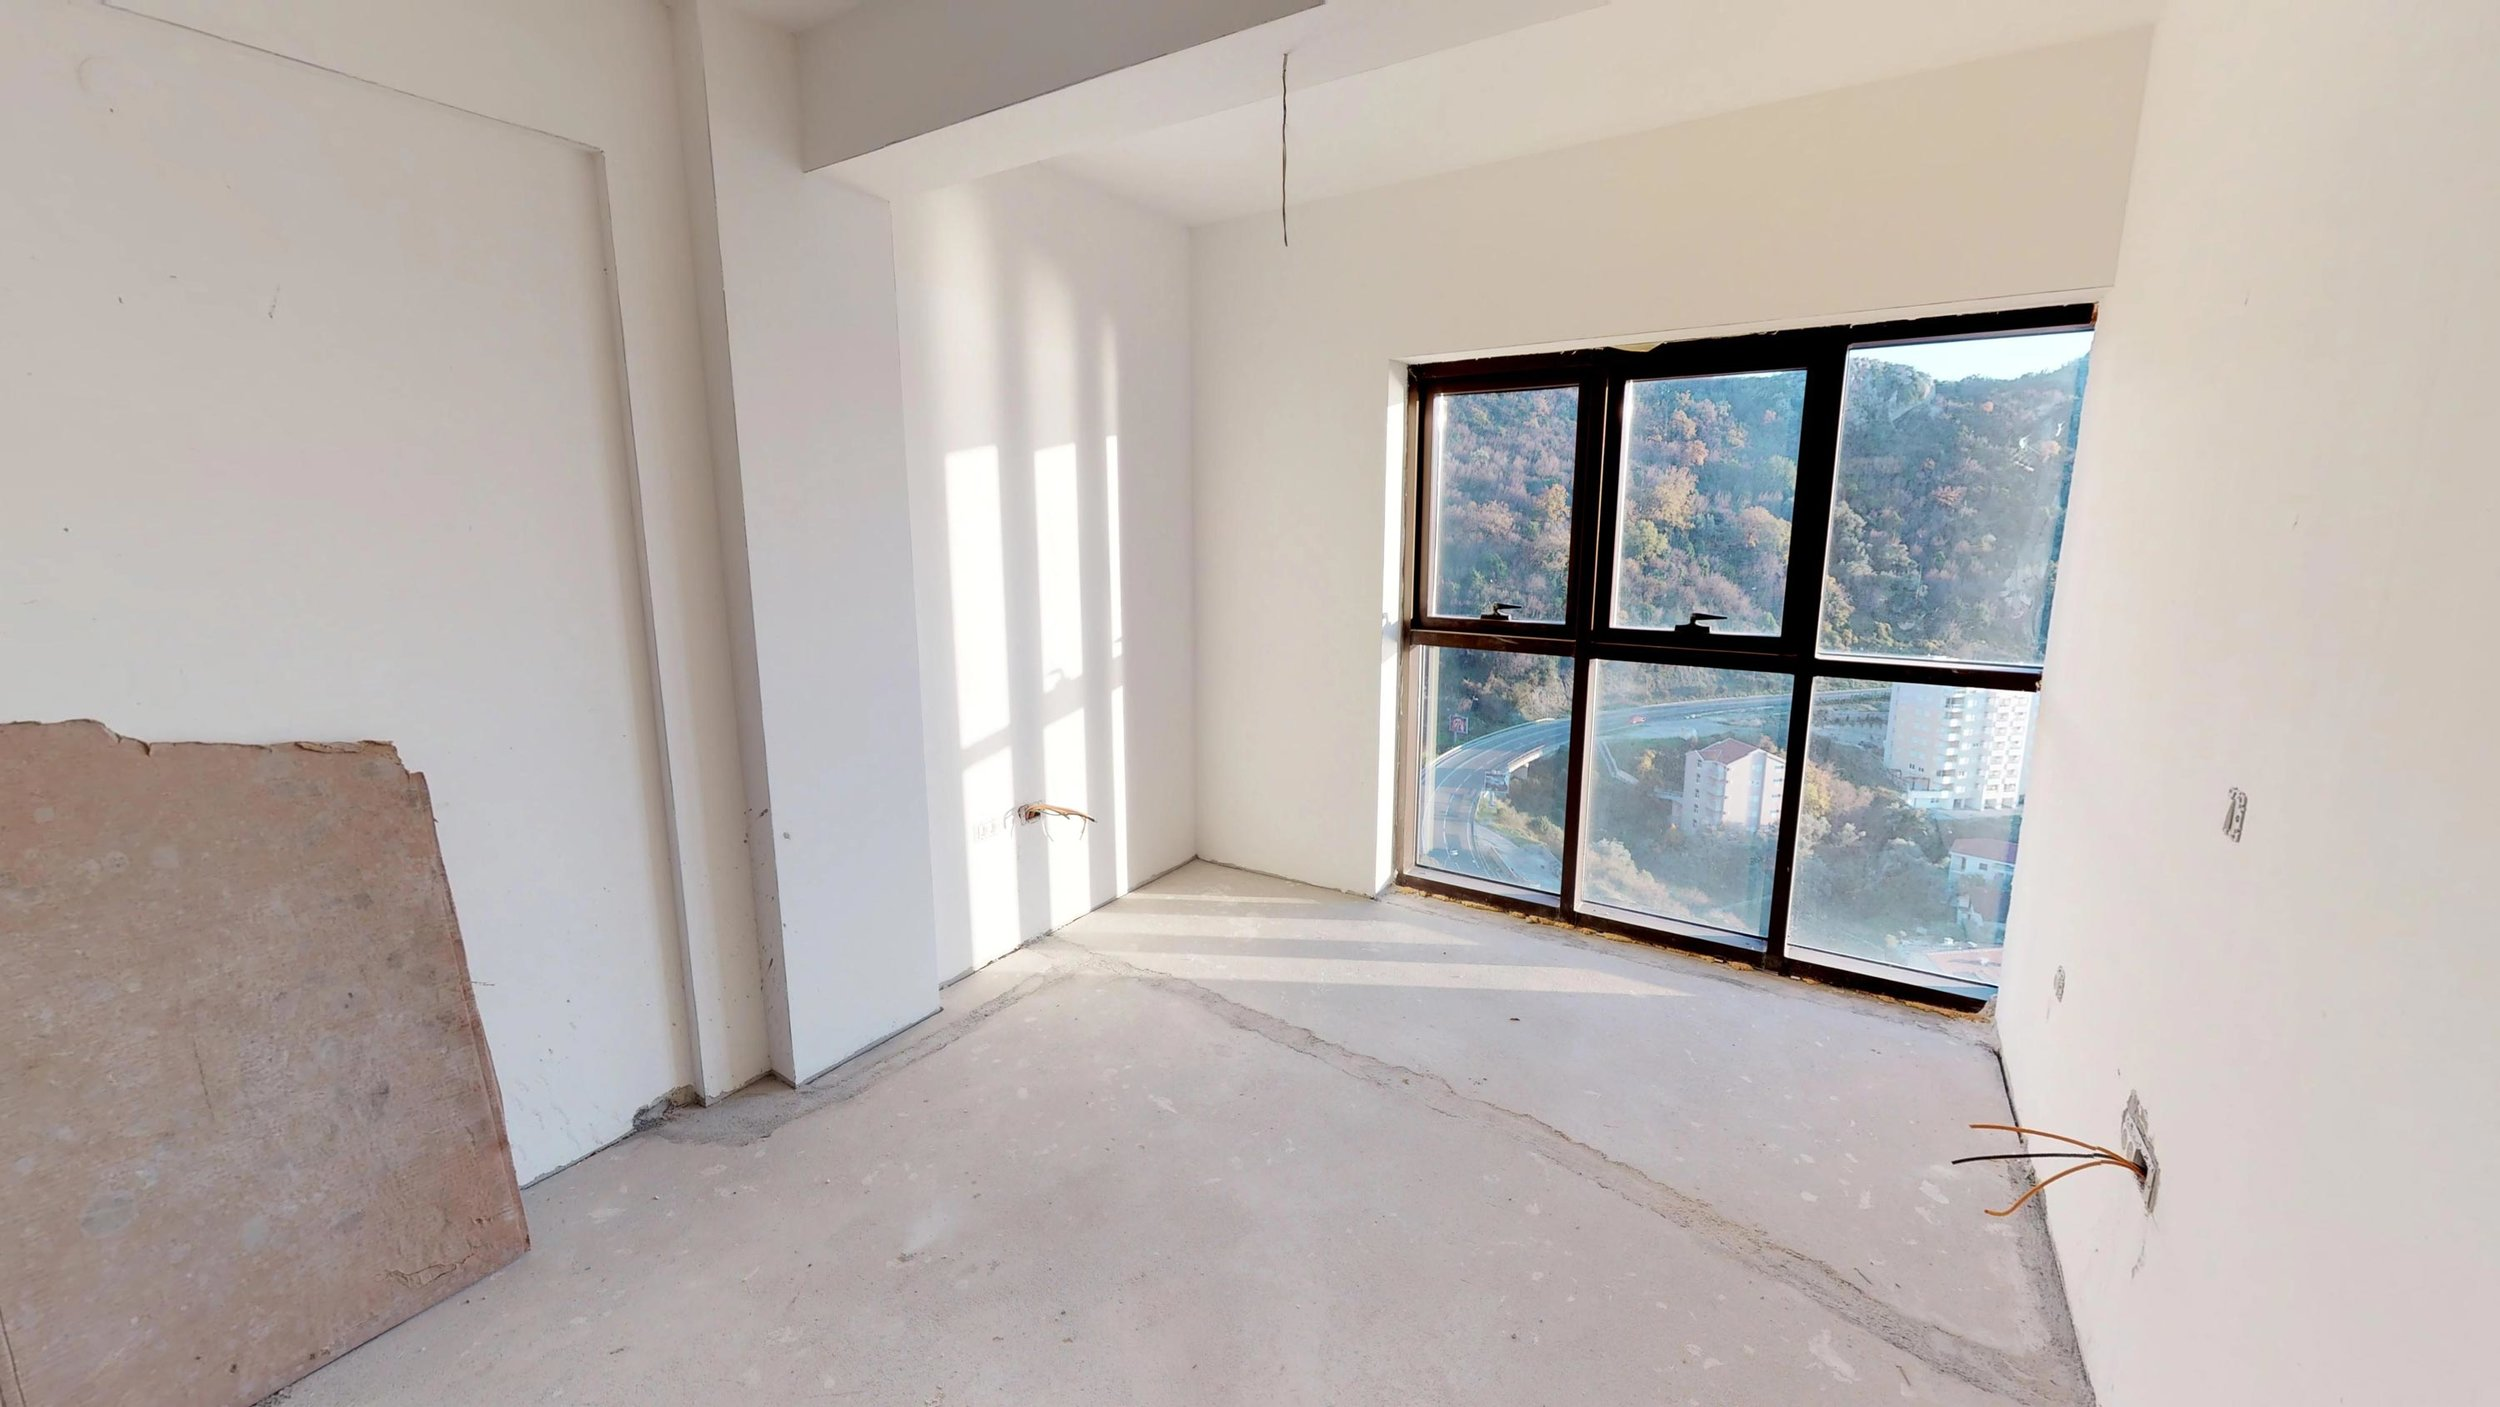 Penthouse-for-sale-in-rafailovice-Montenegro-(3).jpg